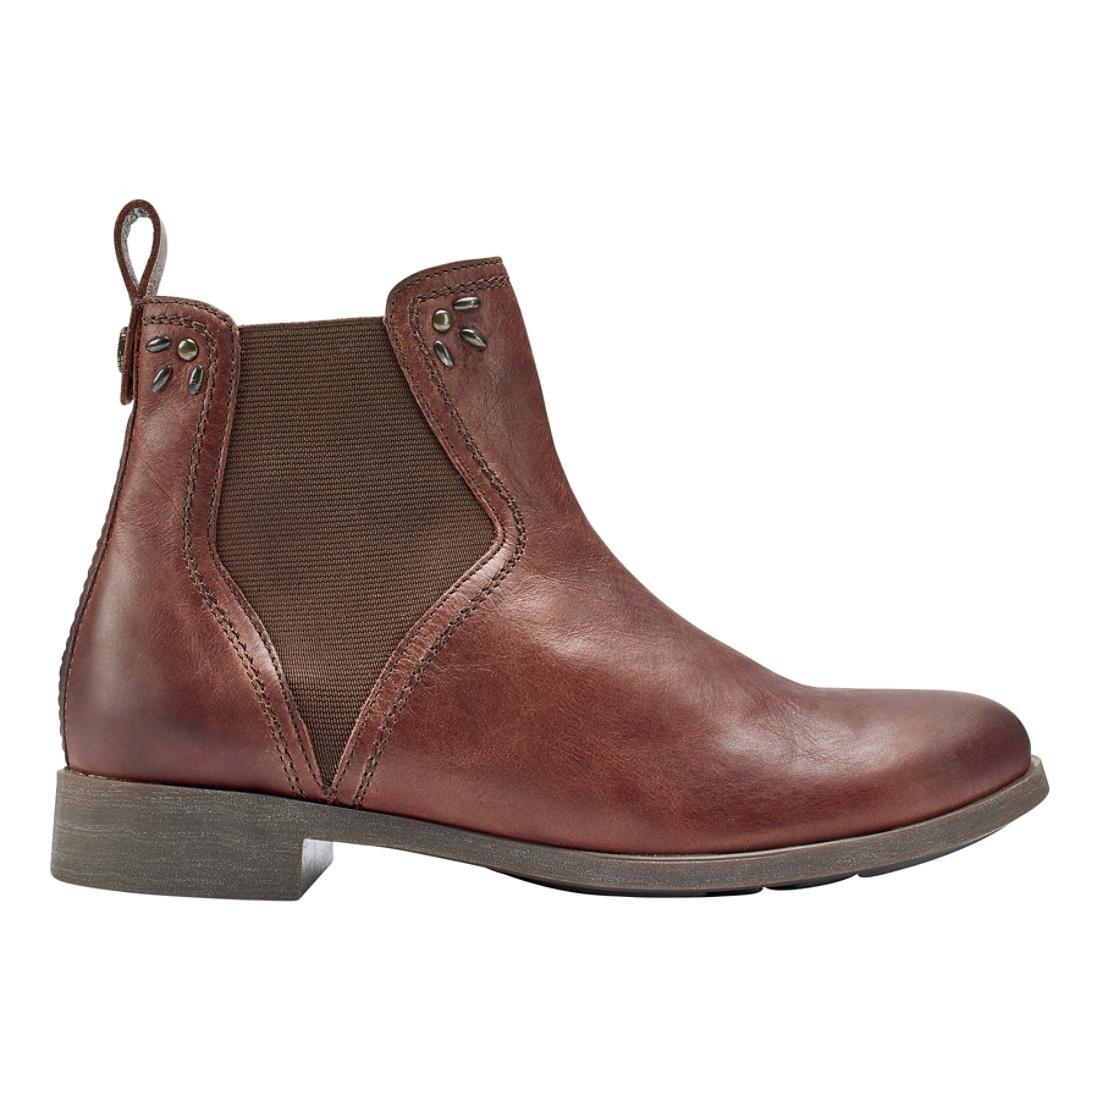 OLUKAI Kualona - Women's Slip-on Comfort Boot B01N6GVEOF 7.5 B(M) US|Friar Brown